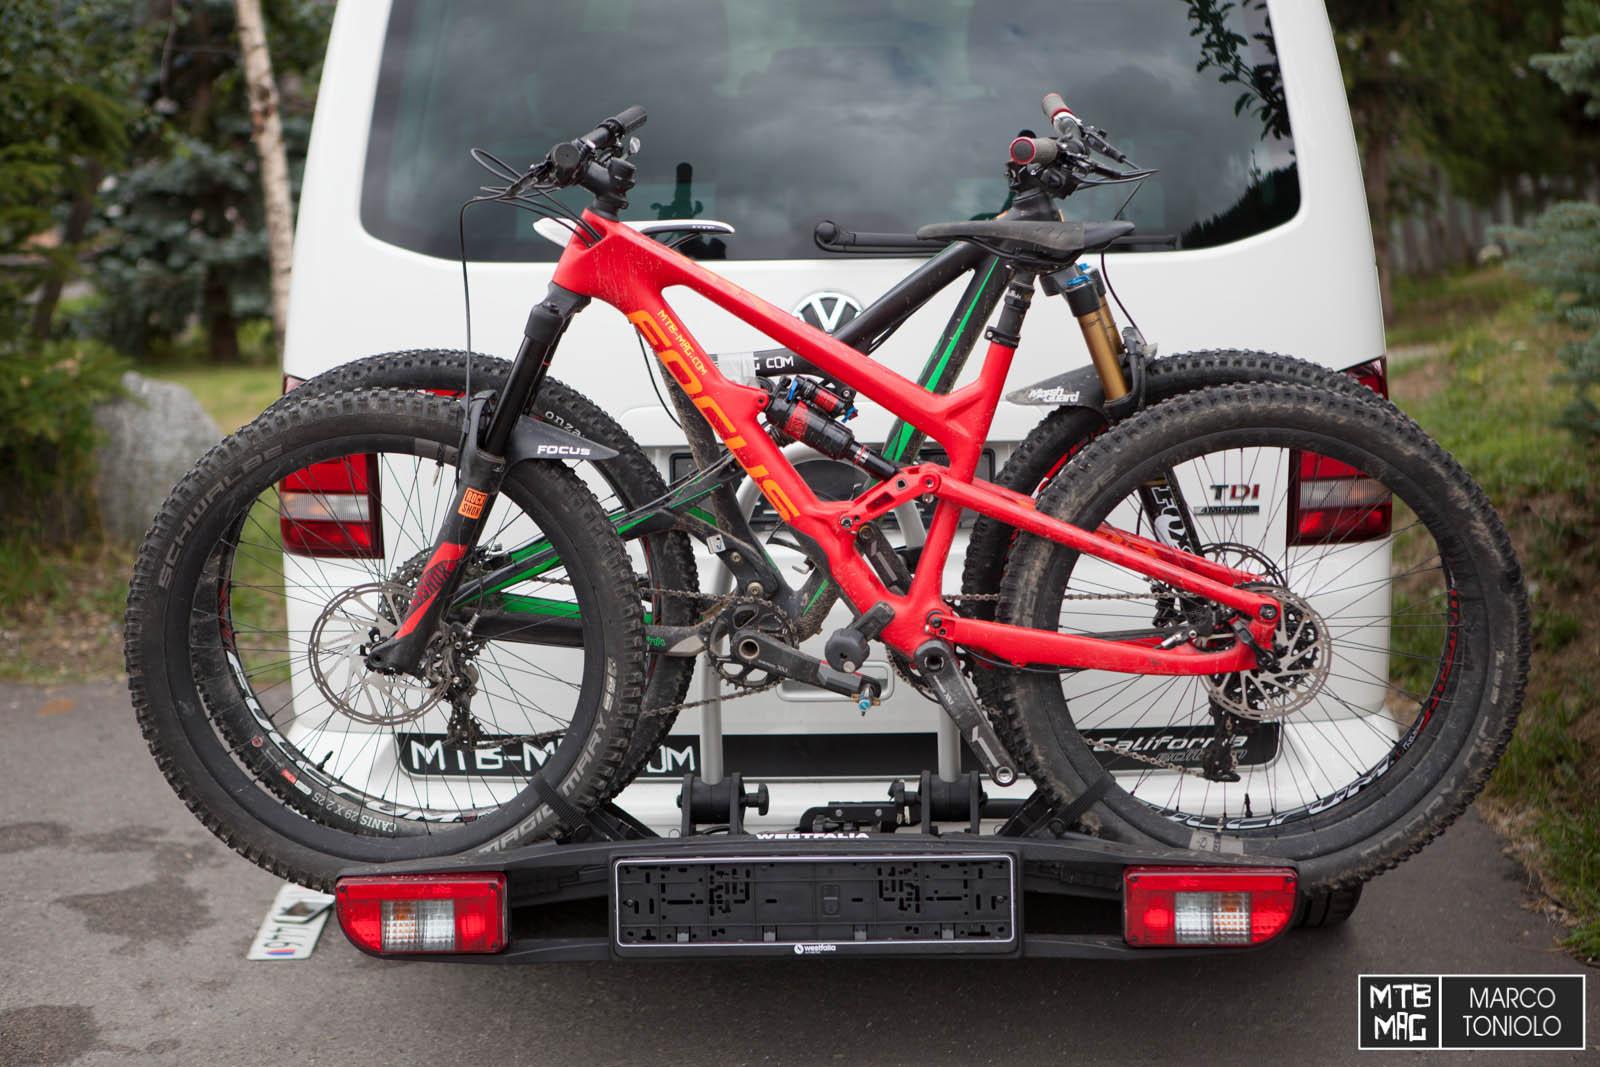 mtb mag com mountain bike online magazine test portabici westfalia bc60. Black Bedroom Furniture Sets. Home Design Ideas